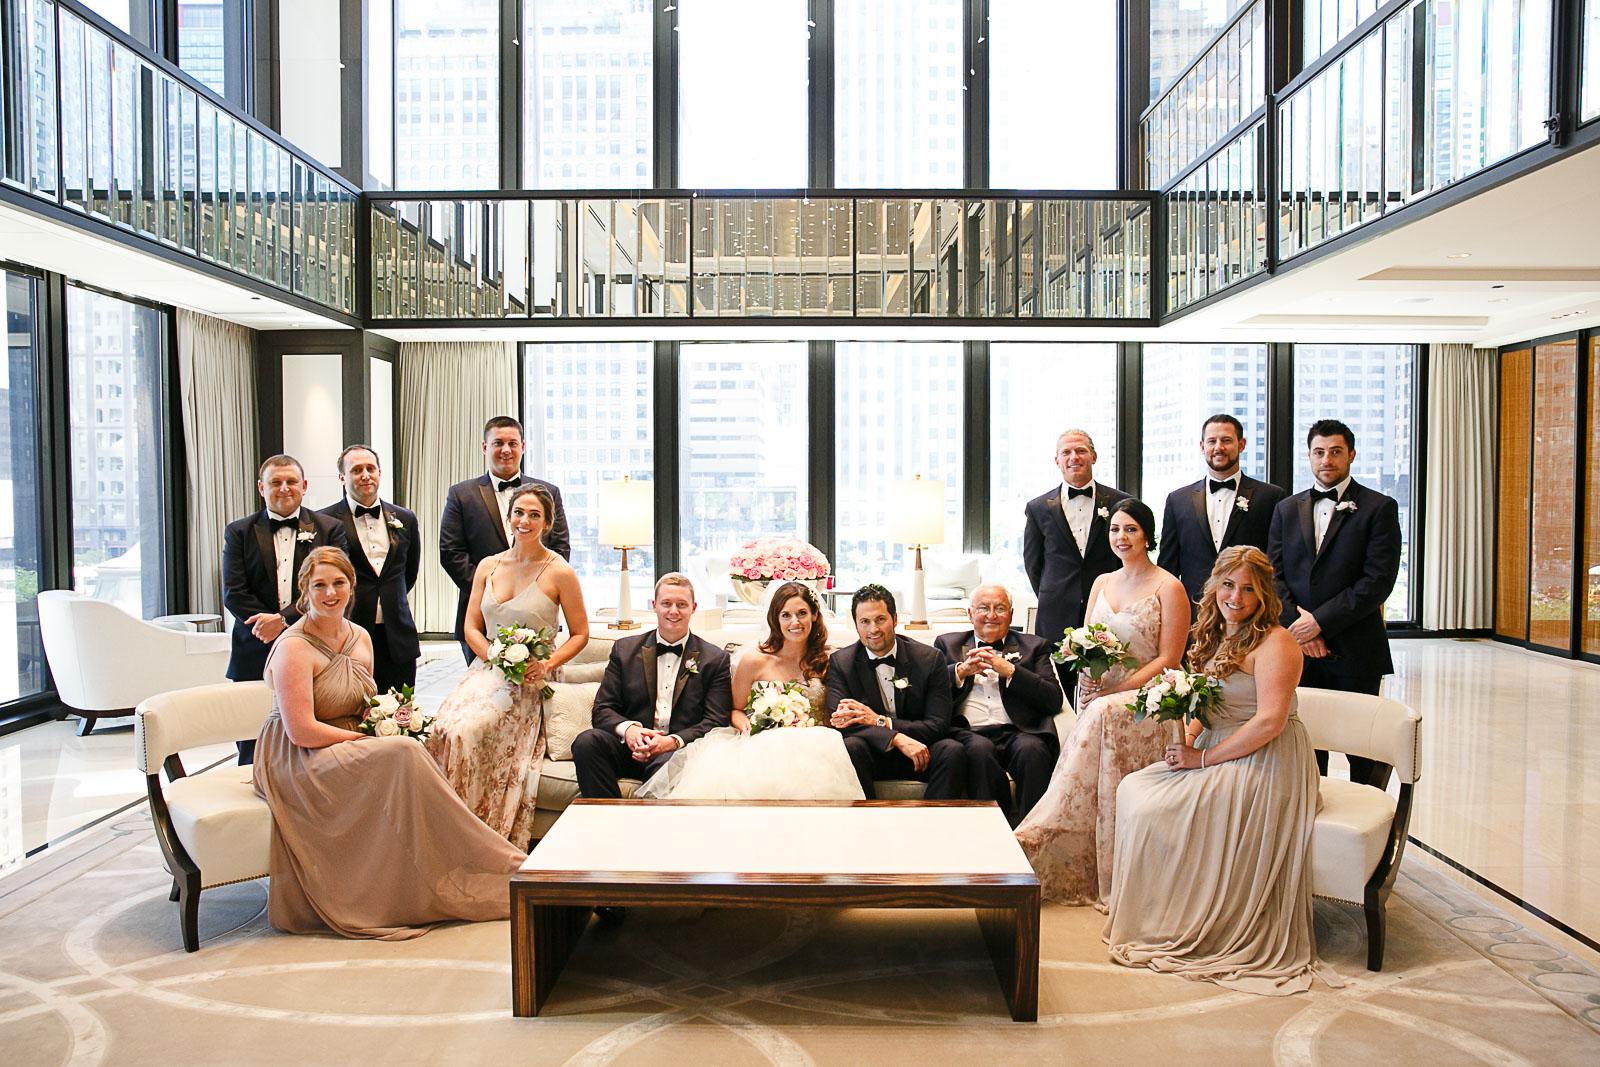 Vanity  Vanity Fair style wedding party photo in the second floor lobby of Chicago's Langham Hotel.